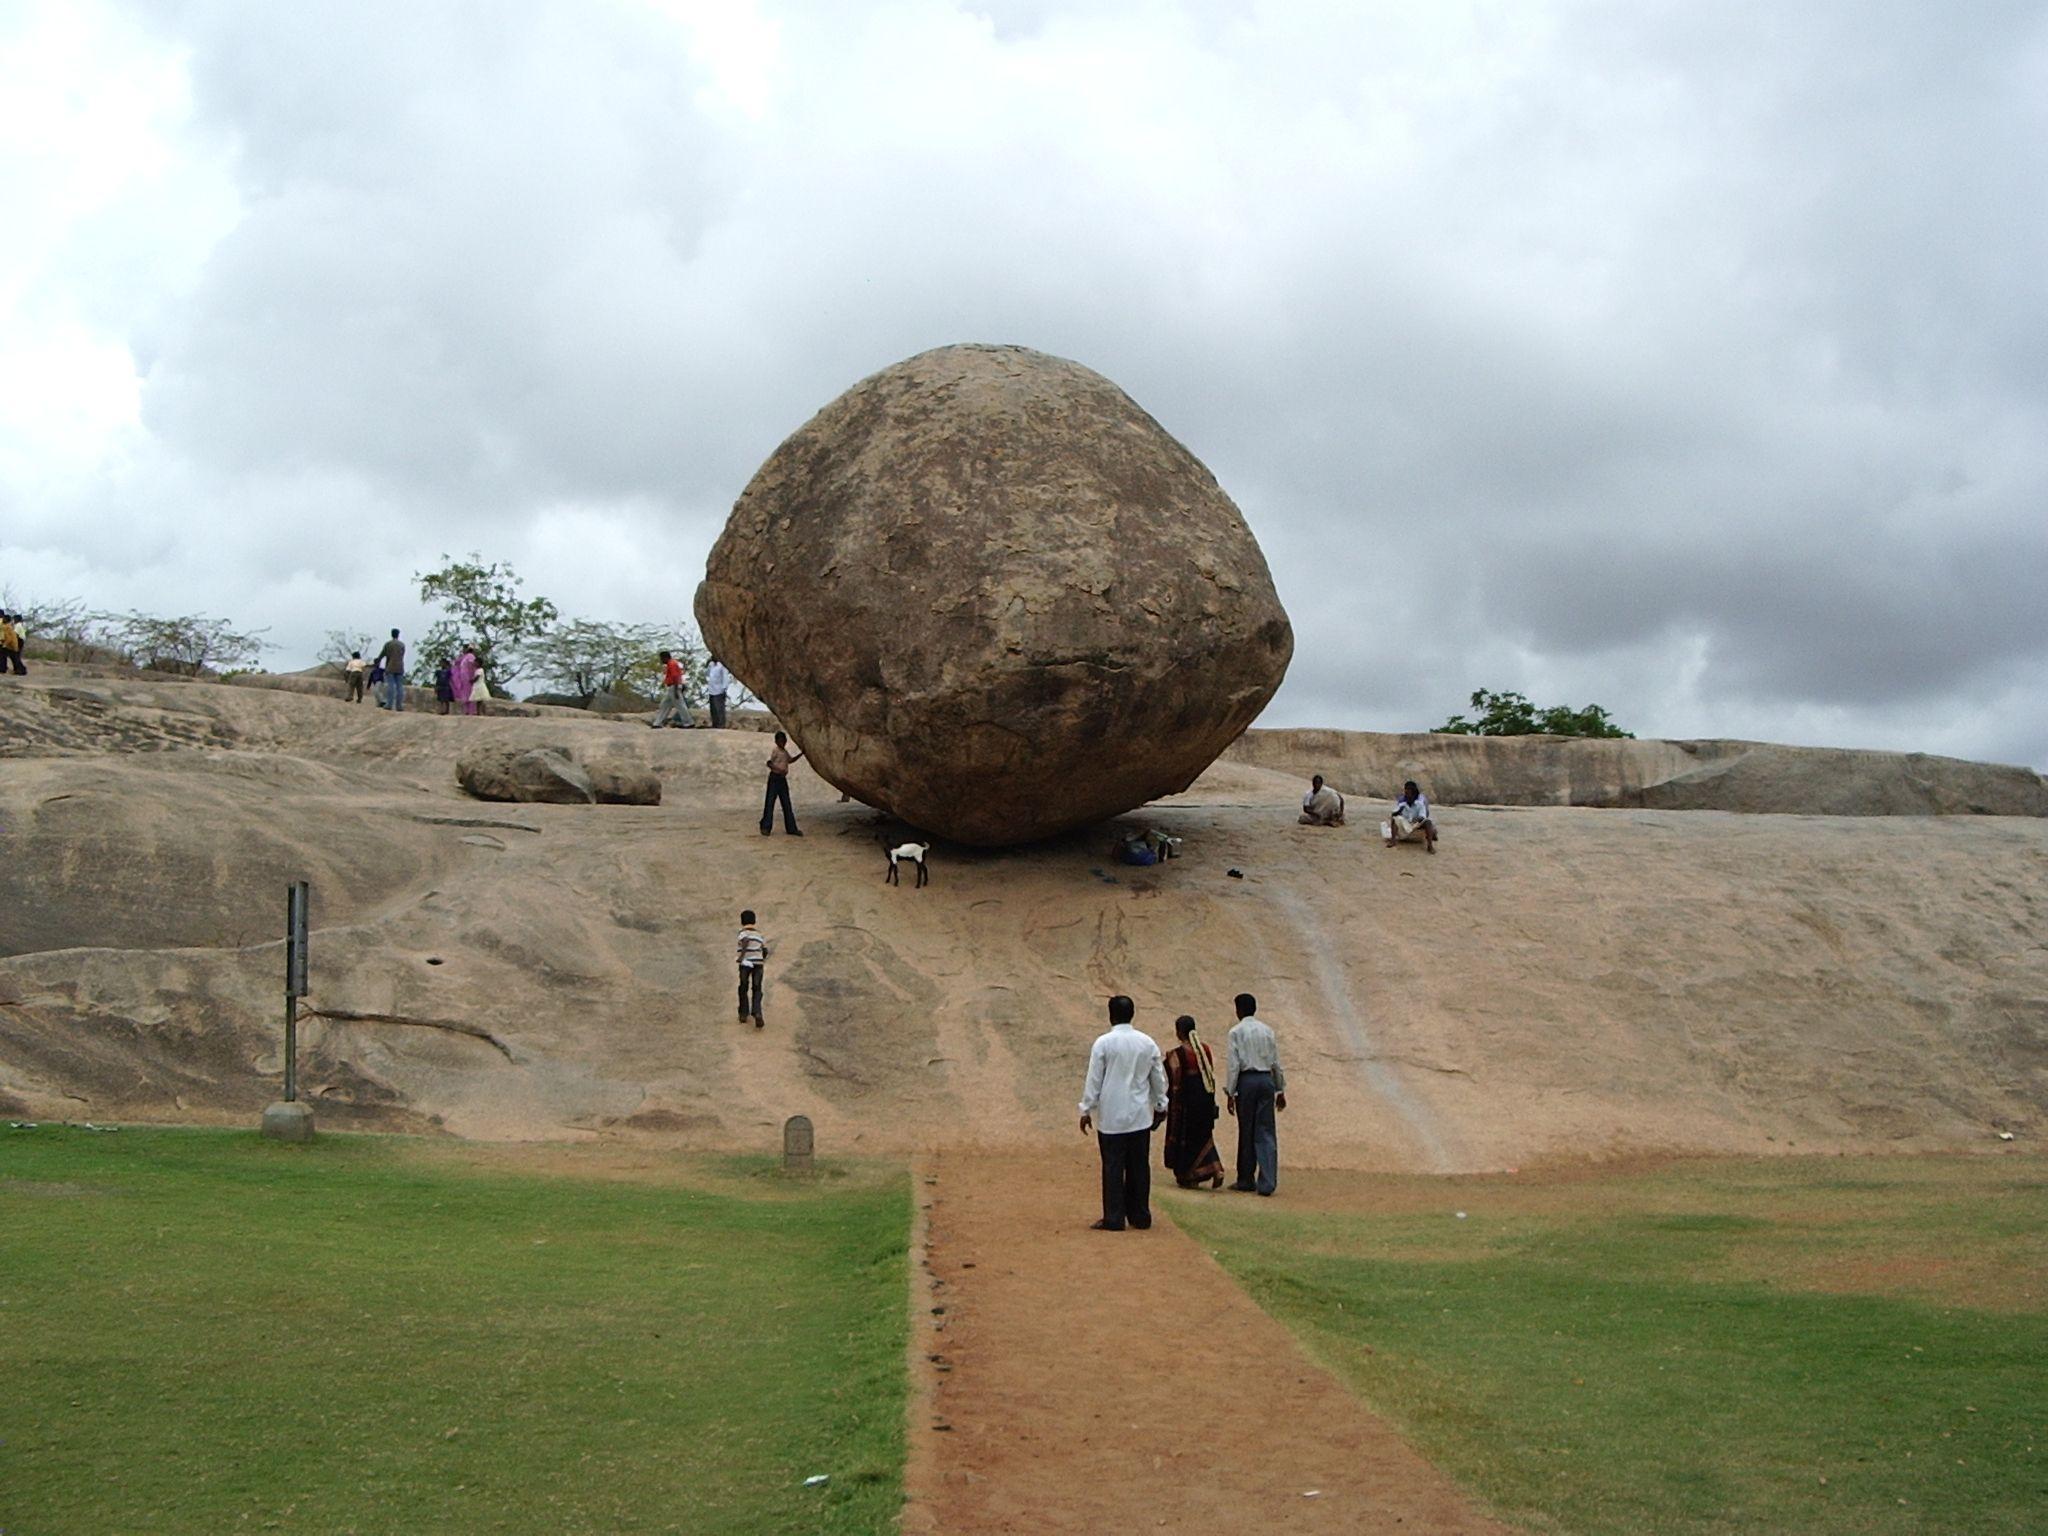 Tamil Nadu Mahabalipuram Rock Incredible India Amazing India India Vacation